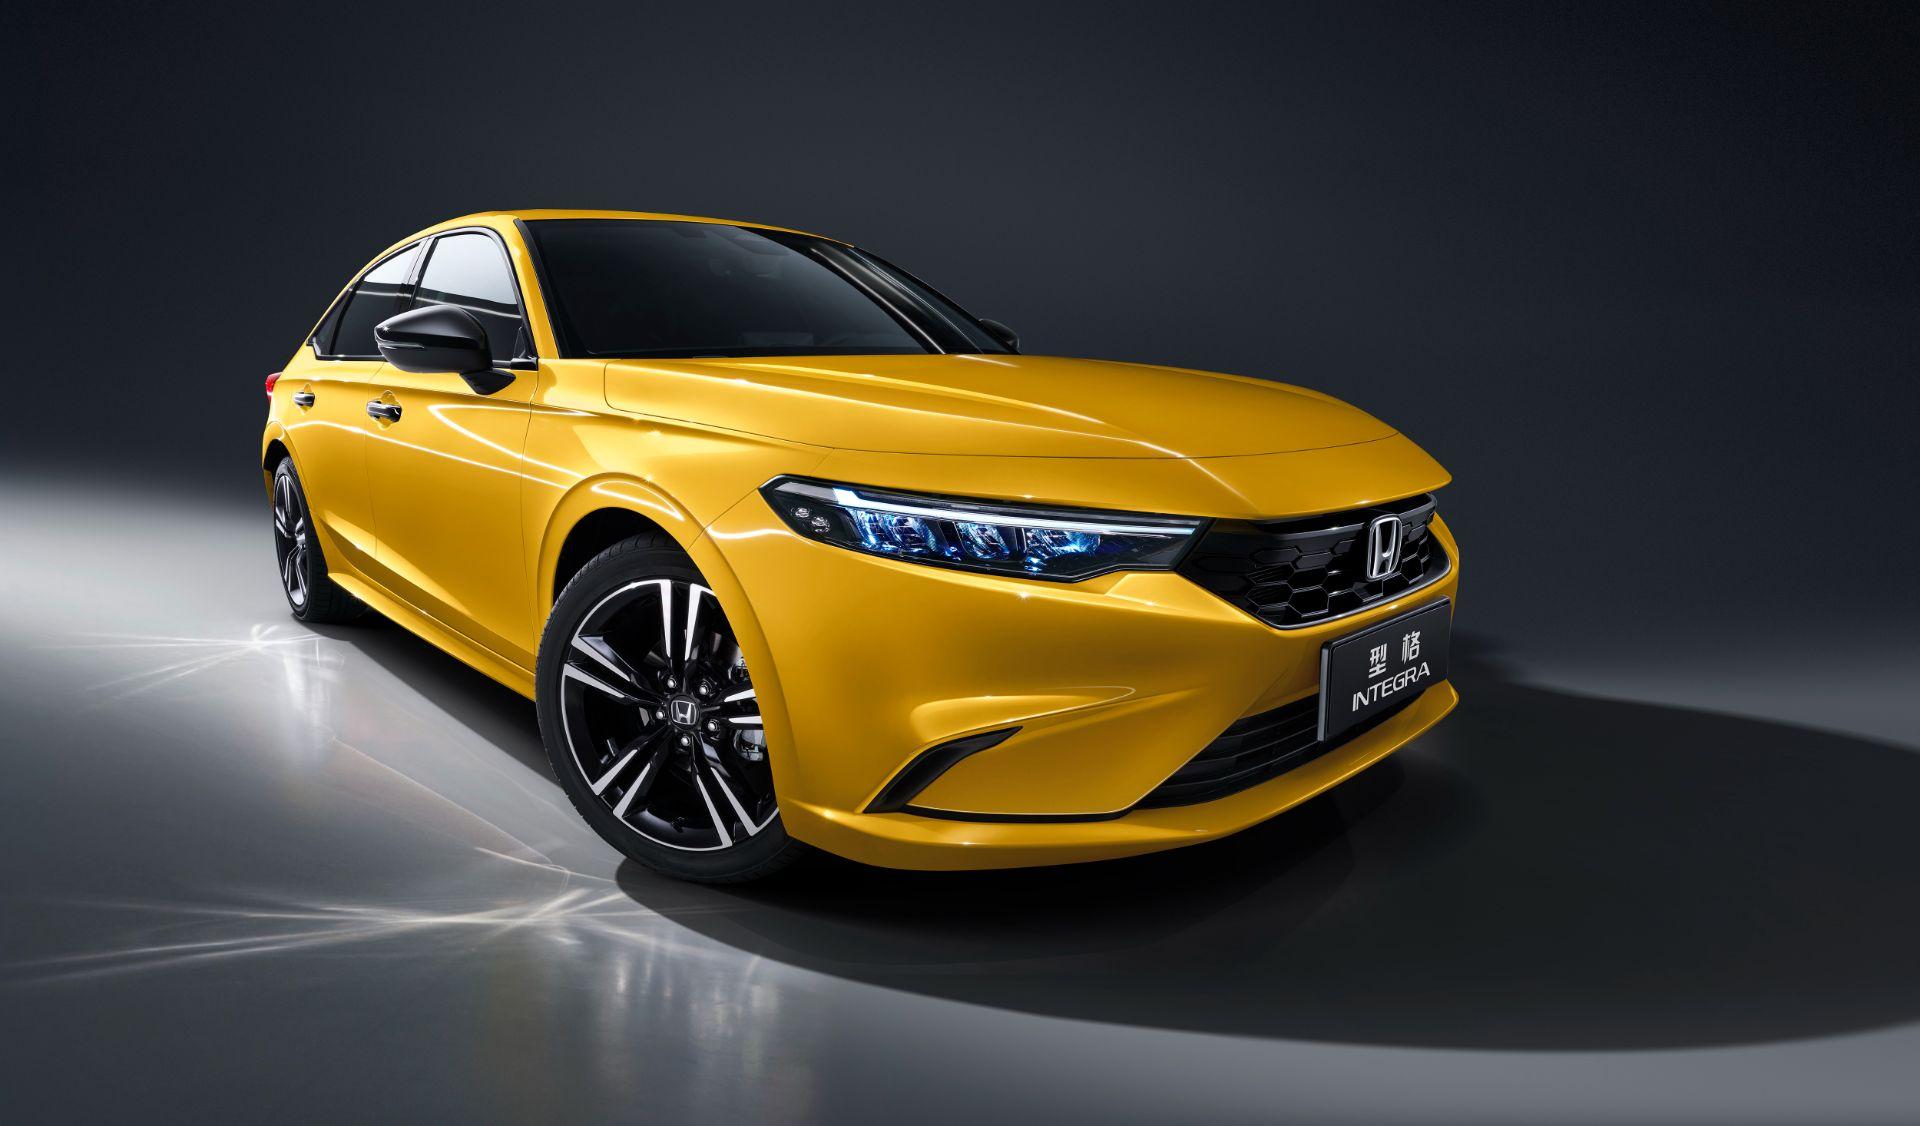 Honda-Integra-2021-china-1